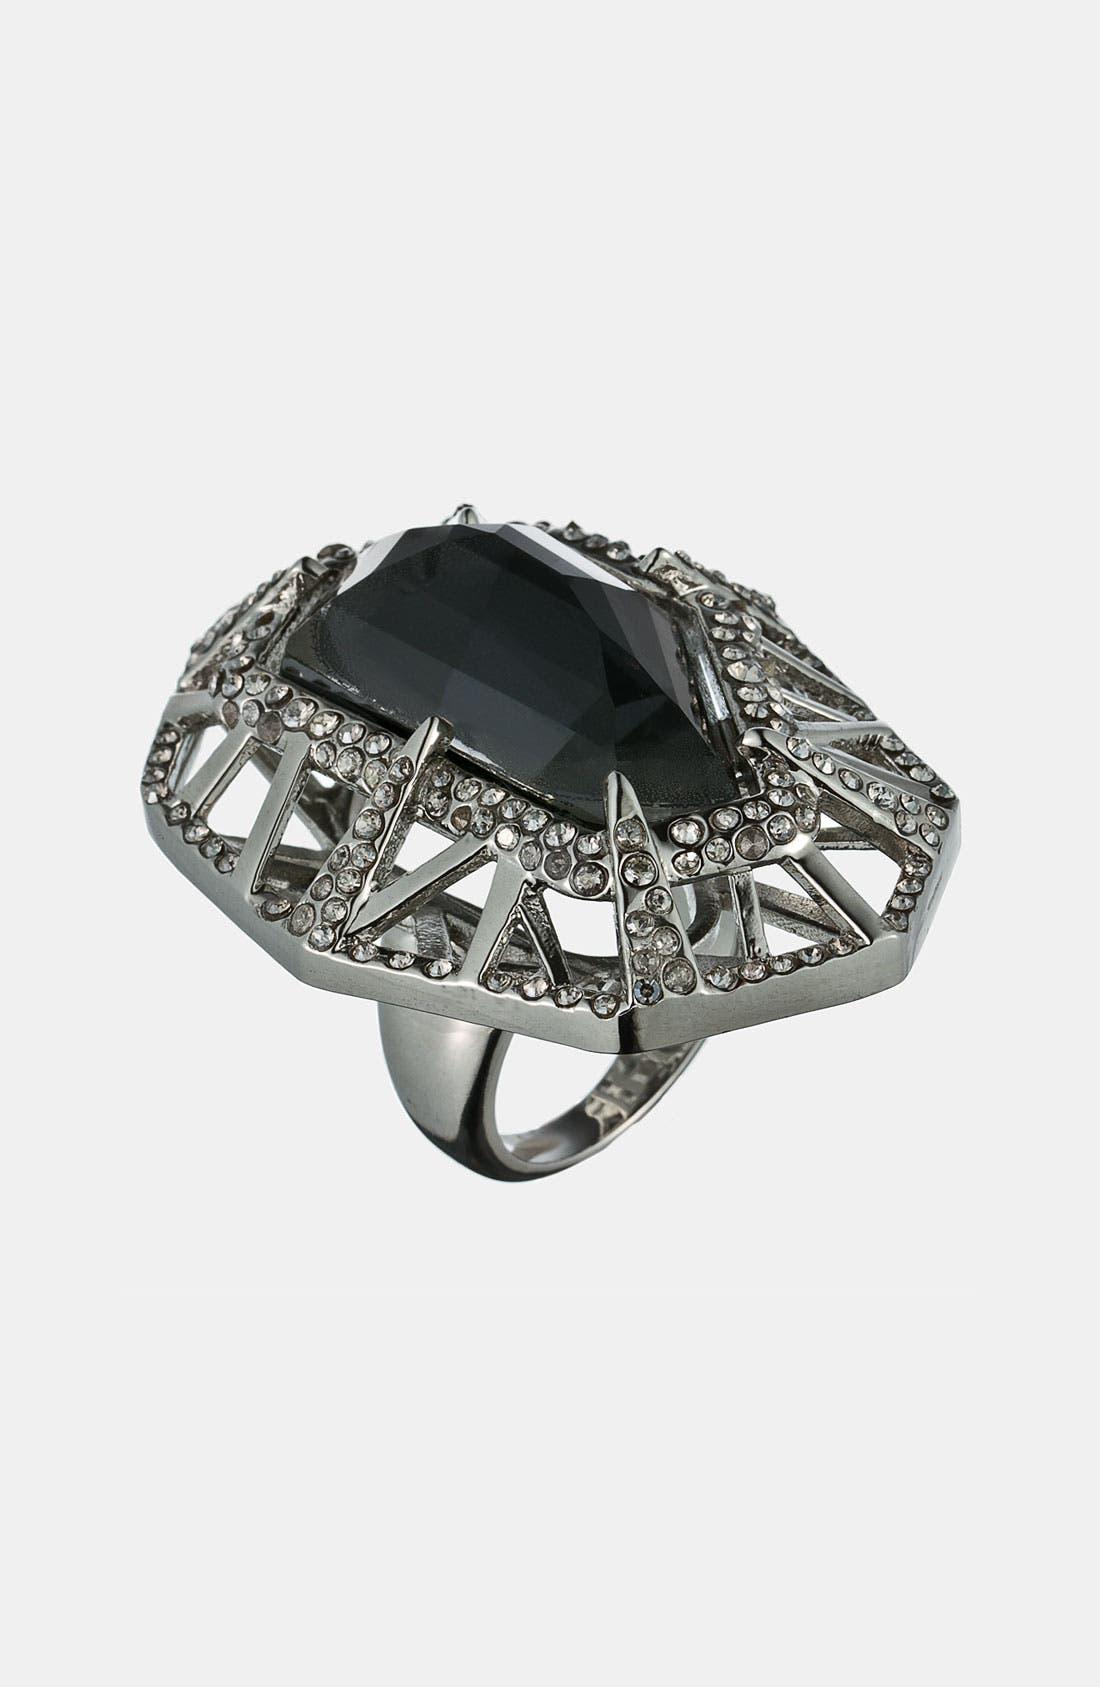 Main Image - Alexis Bittar 'Miss Havisham - Delano' Cocktail Ring (Limited Edition)